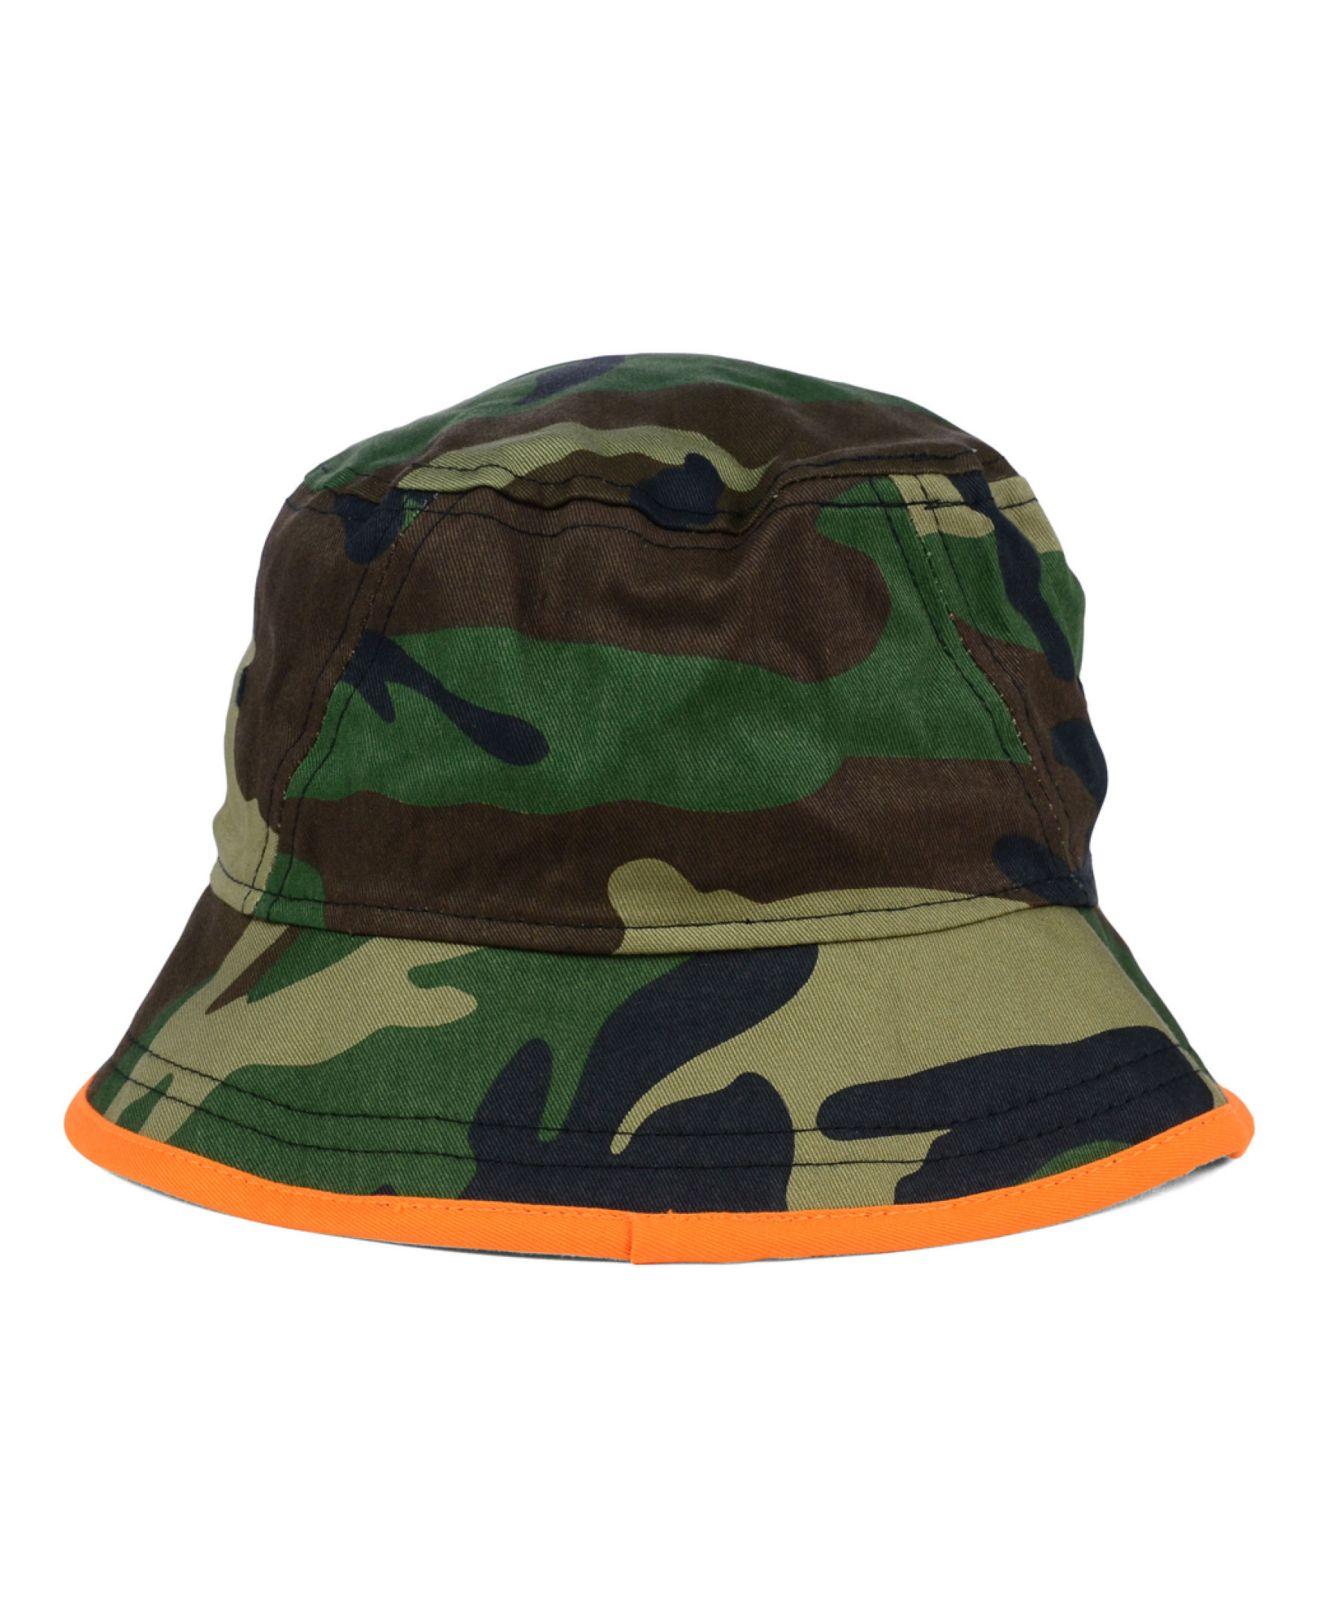 314758cef5f ... usa miami dolphins bucket hat lyst ktz miami dolphins camo pop bucket  hat in green for ...